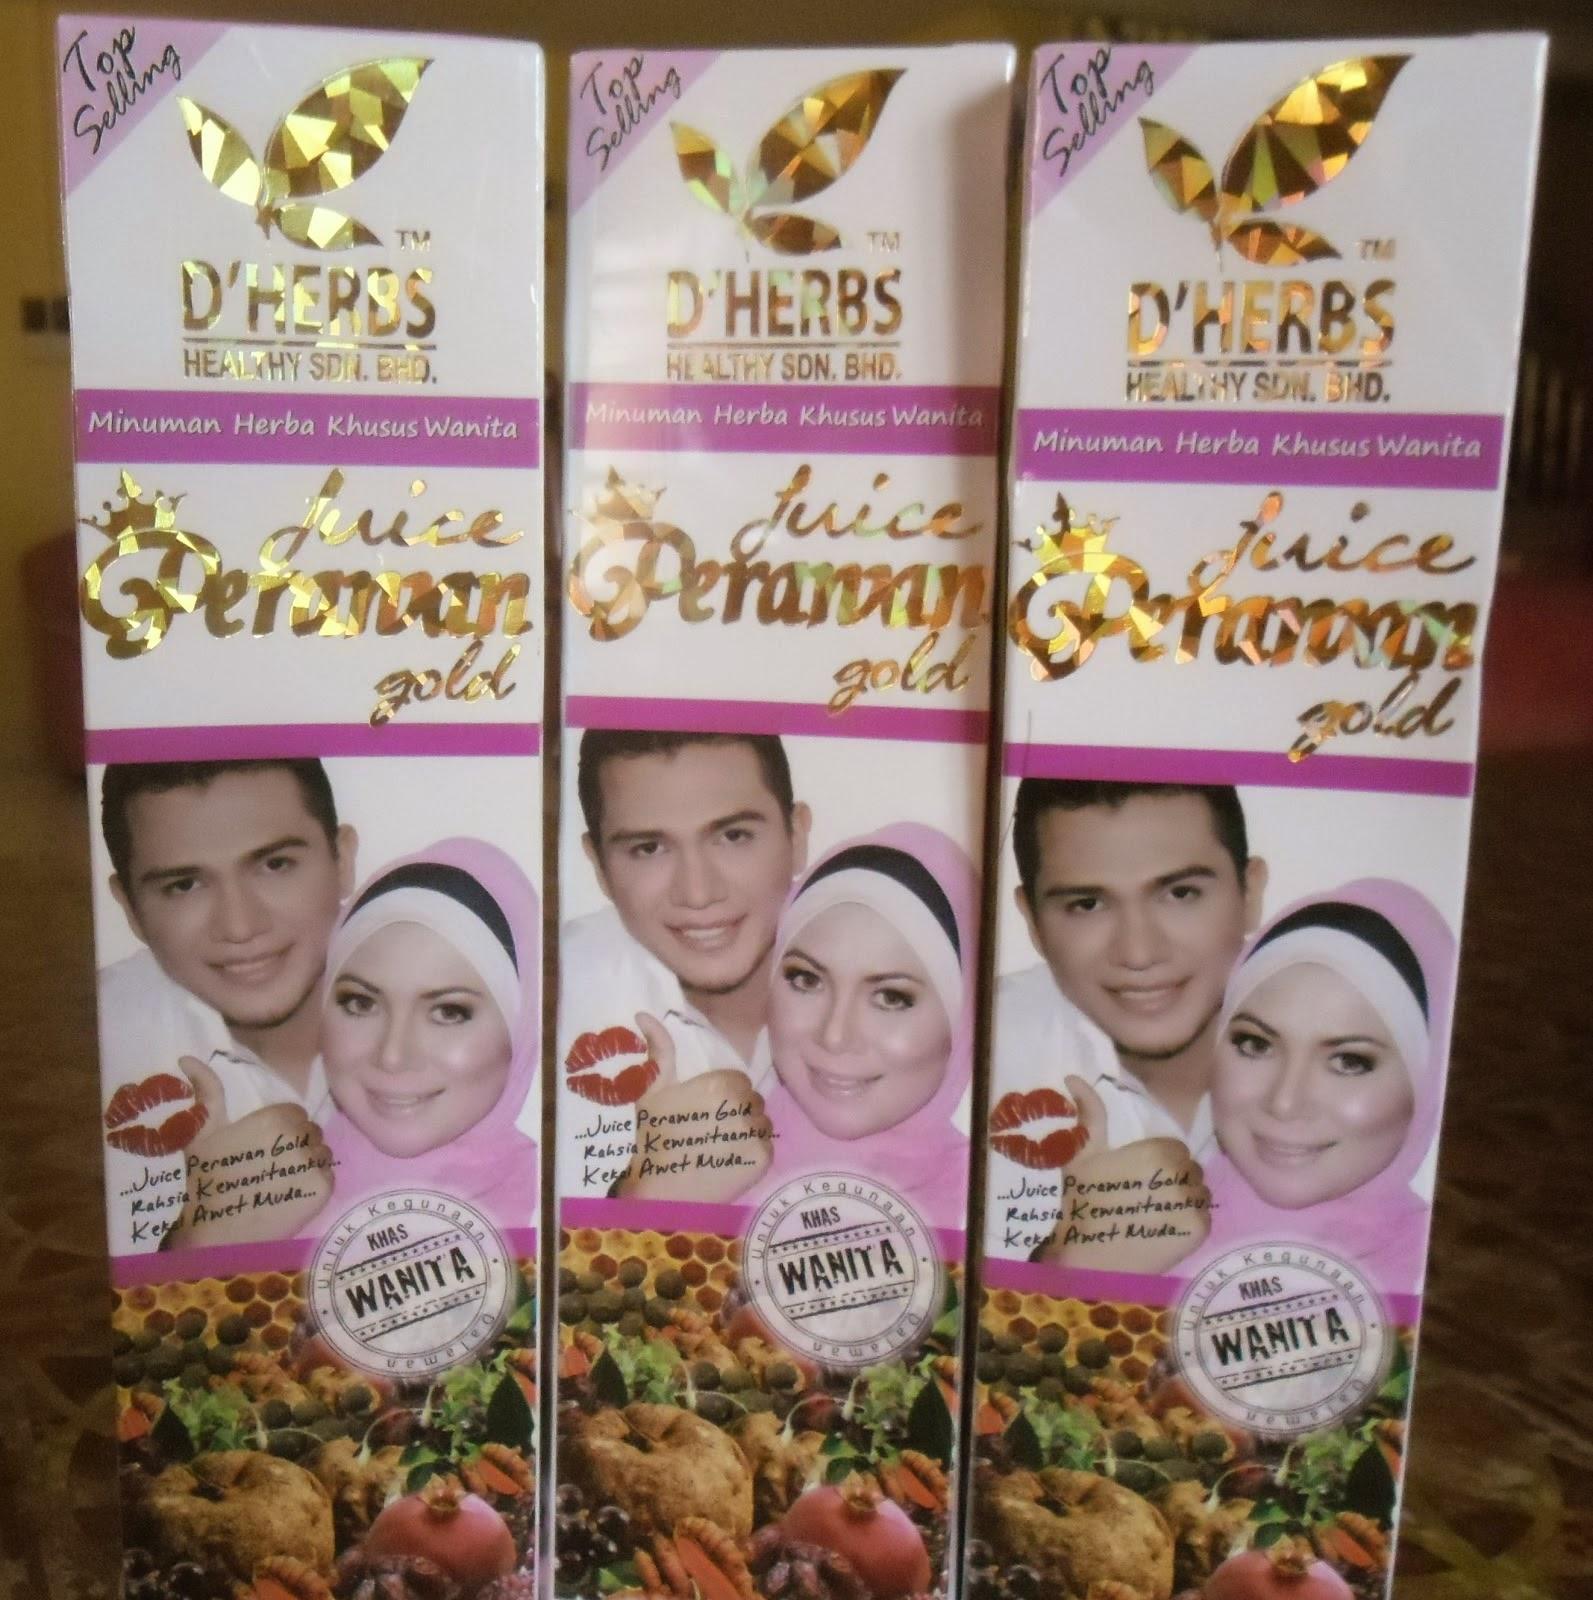 Qala Sakura D Herbs Jus Perawan Gold